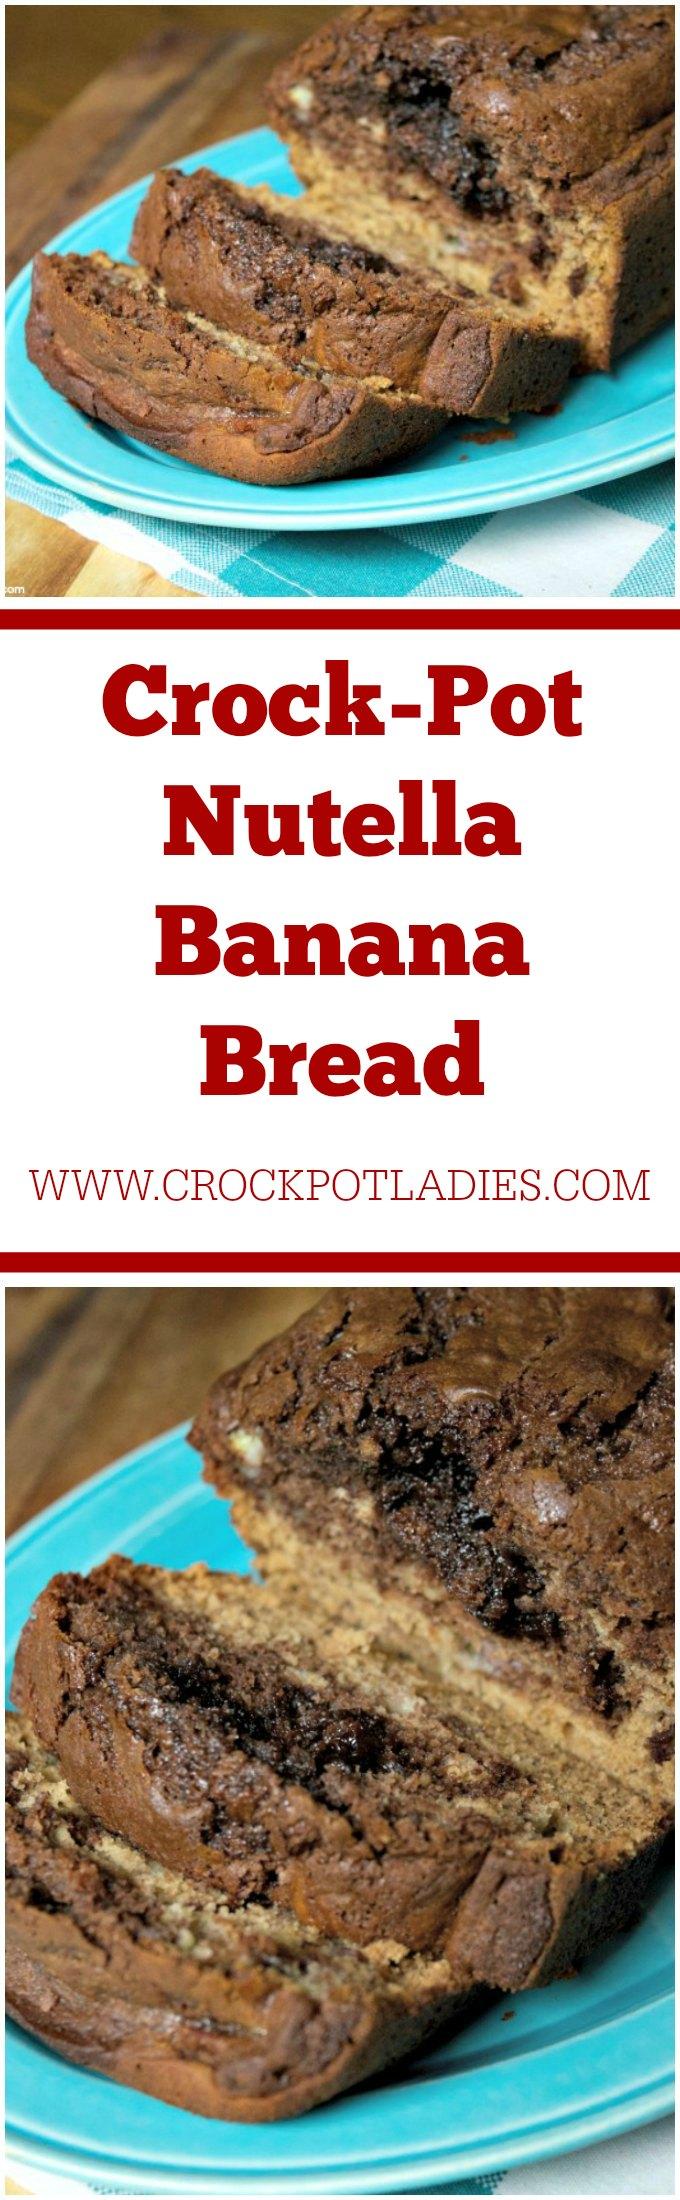 Crock-Pot Nutella Banana Bread